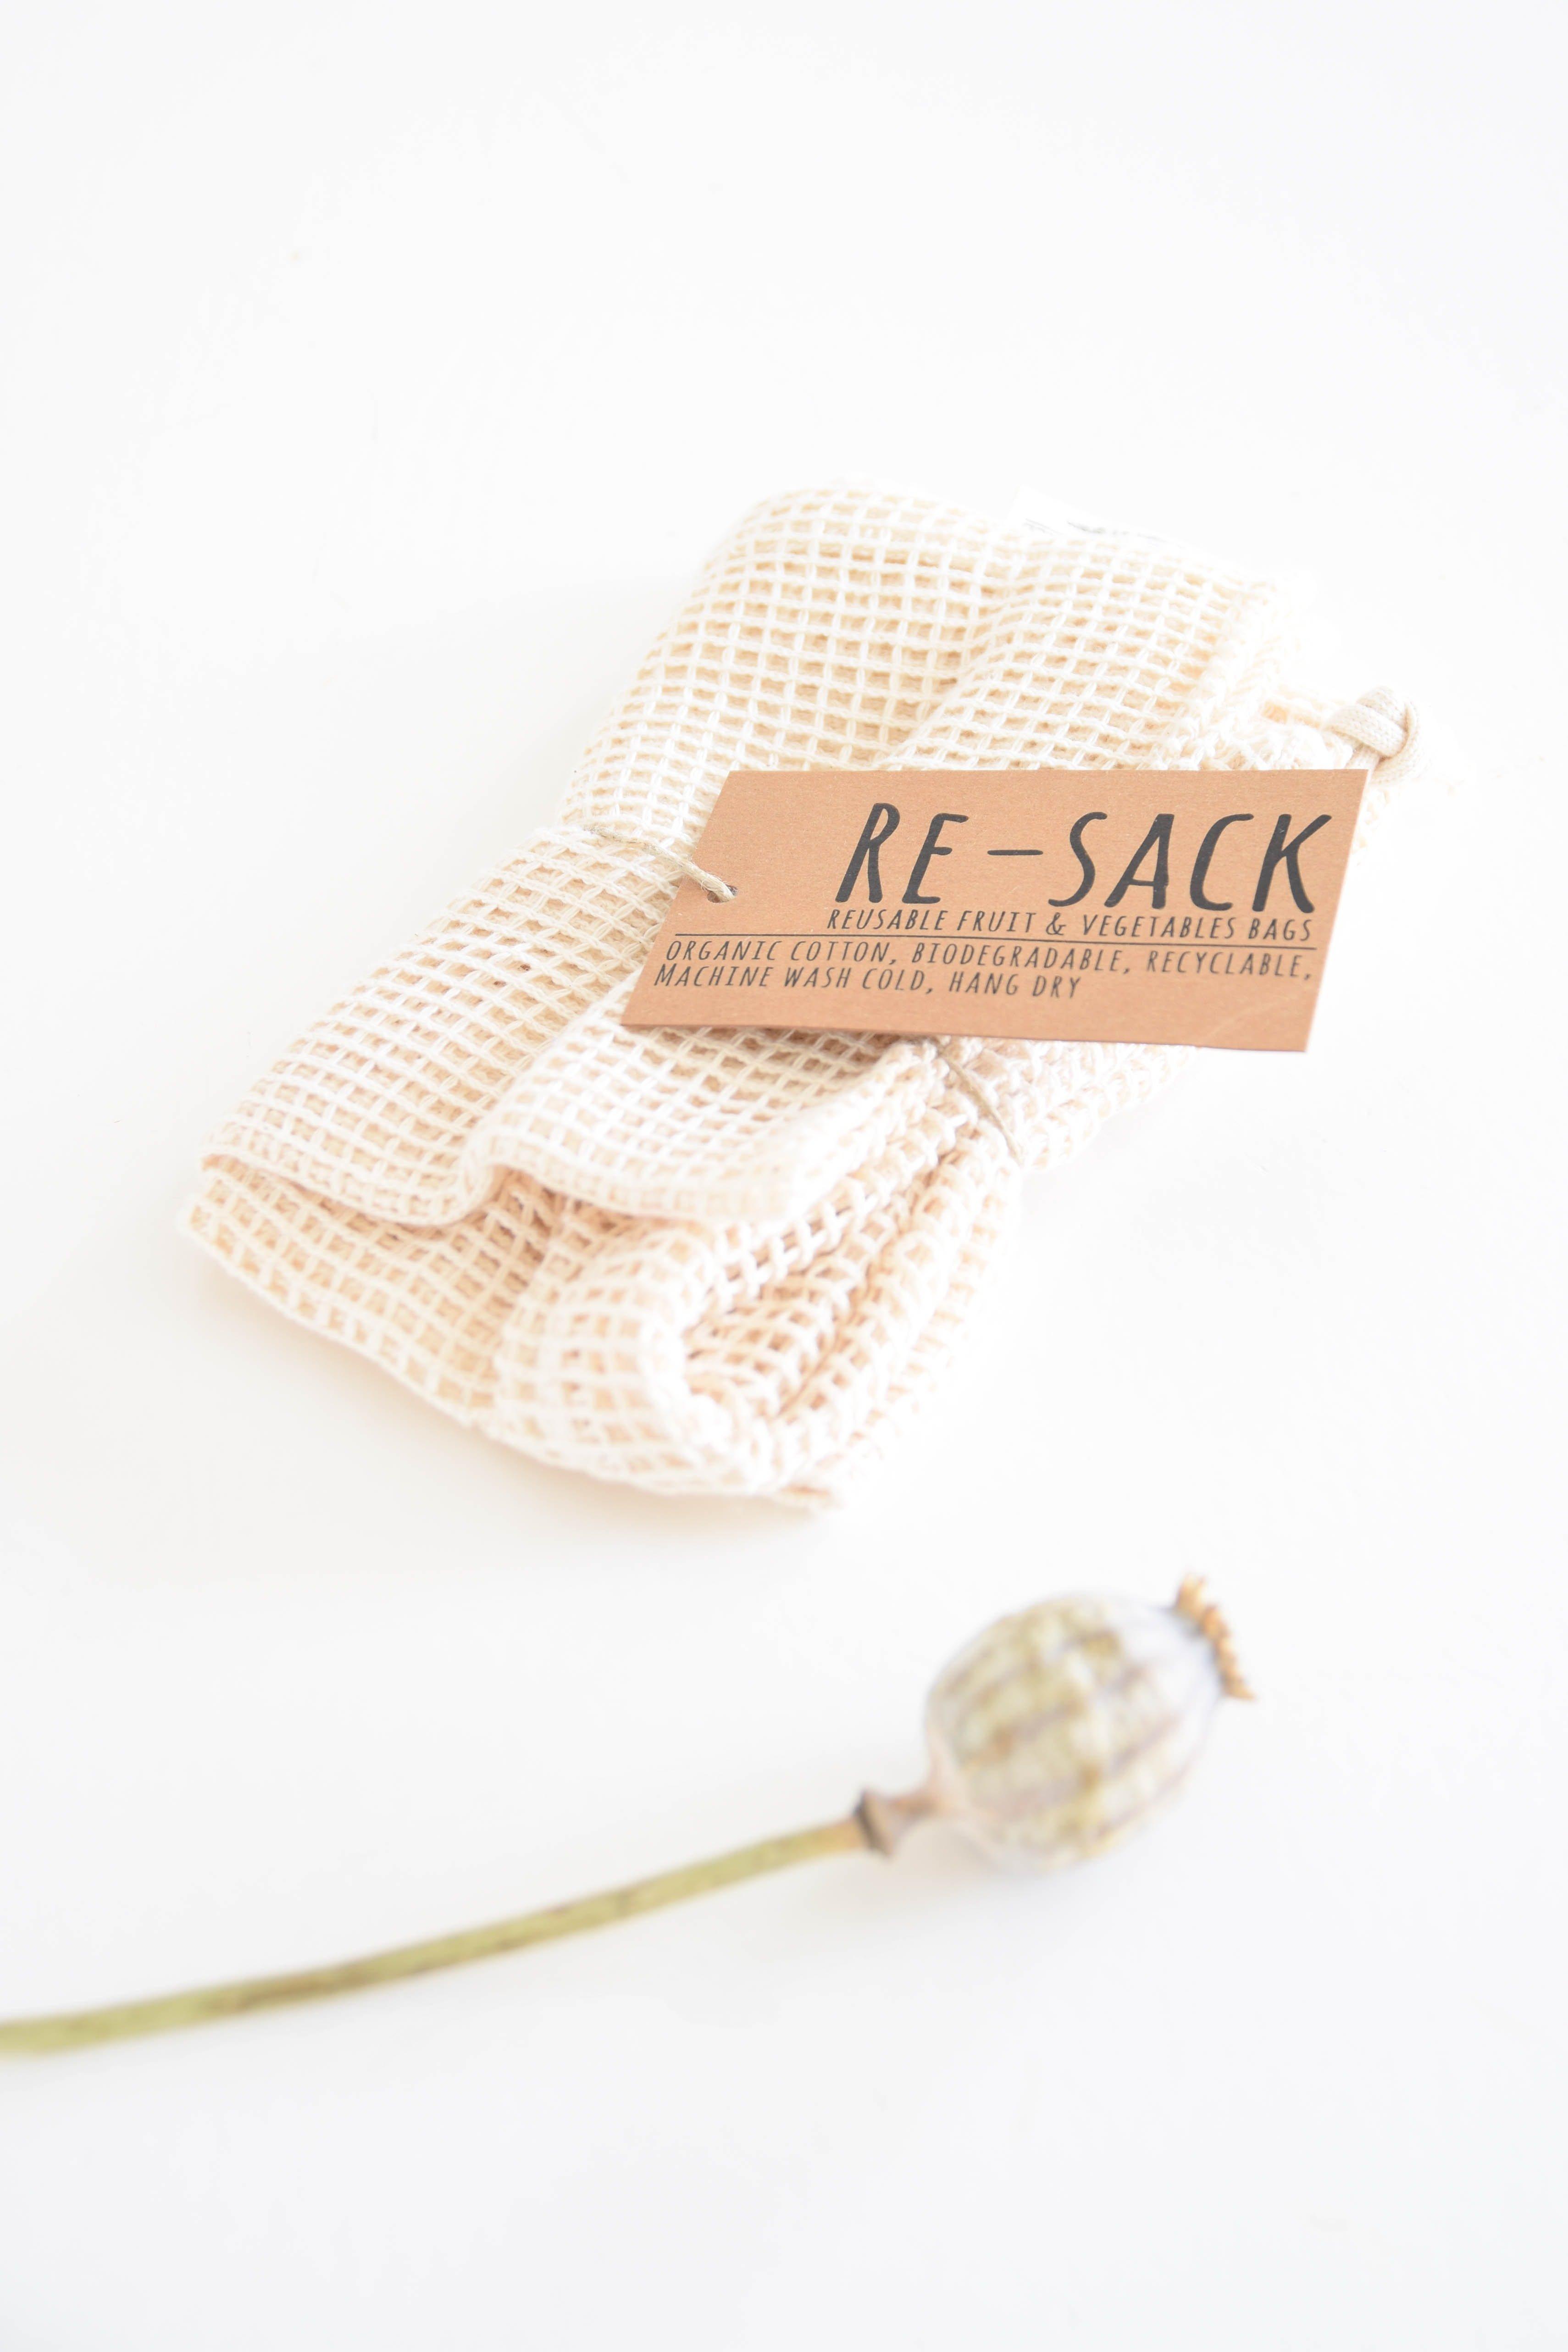 Re-sack plastic terugdringen